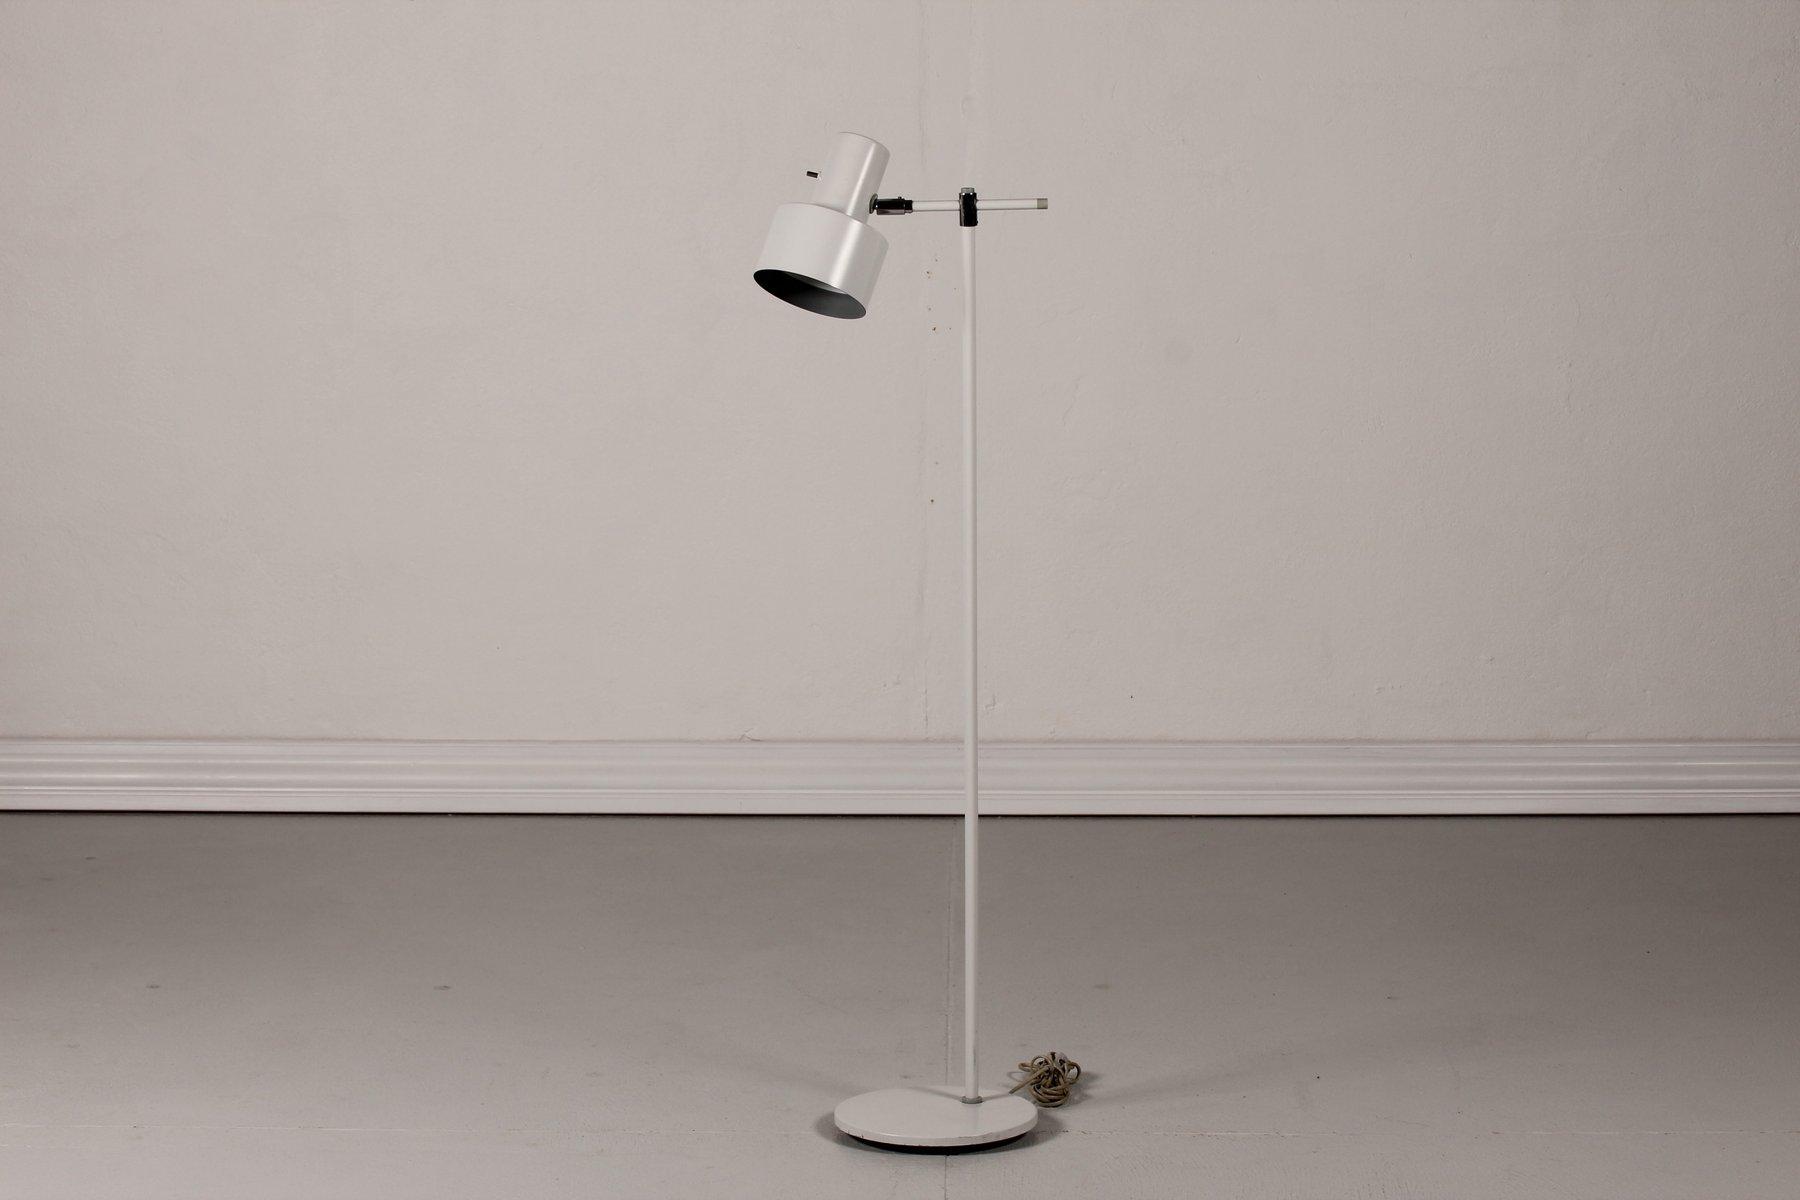 d nische lento lese stehlampe von jo hammerborg f r fog. Black Bedroom Furniture Sets. Home Design Ideas